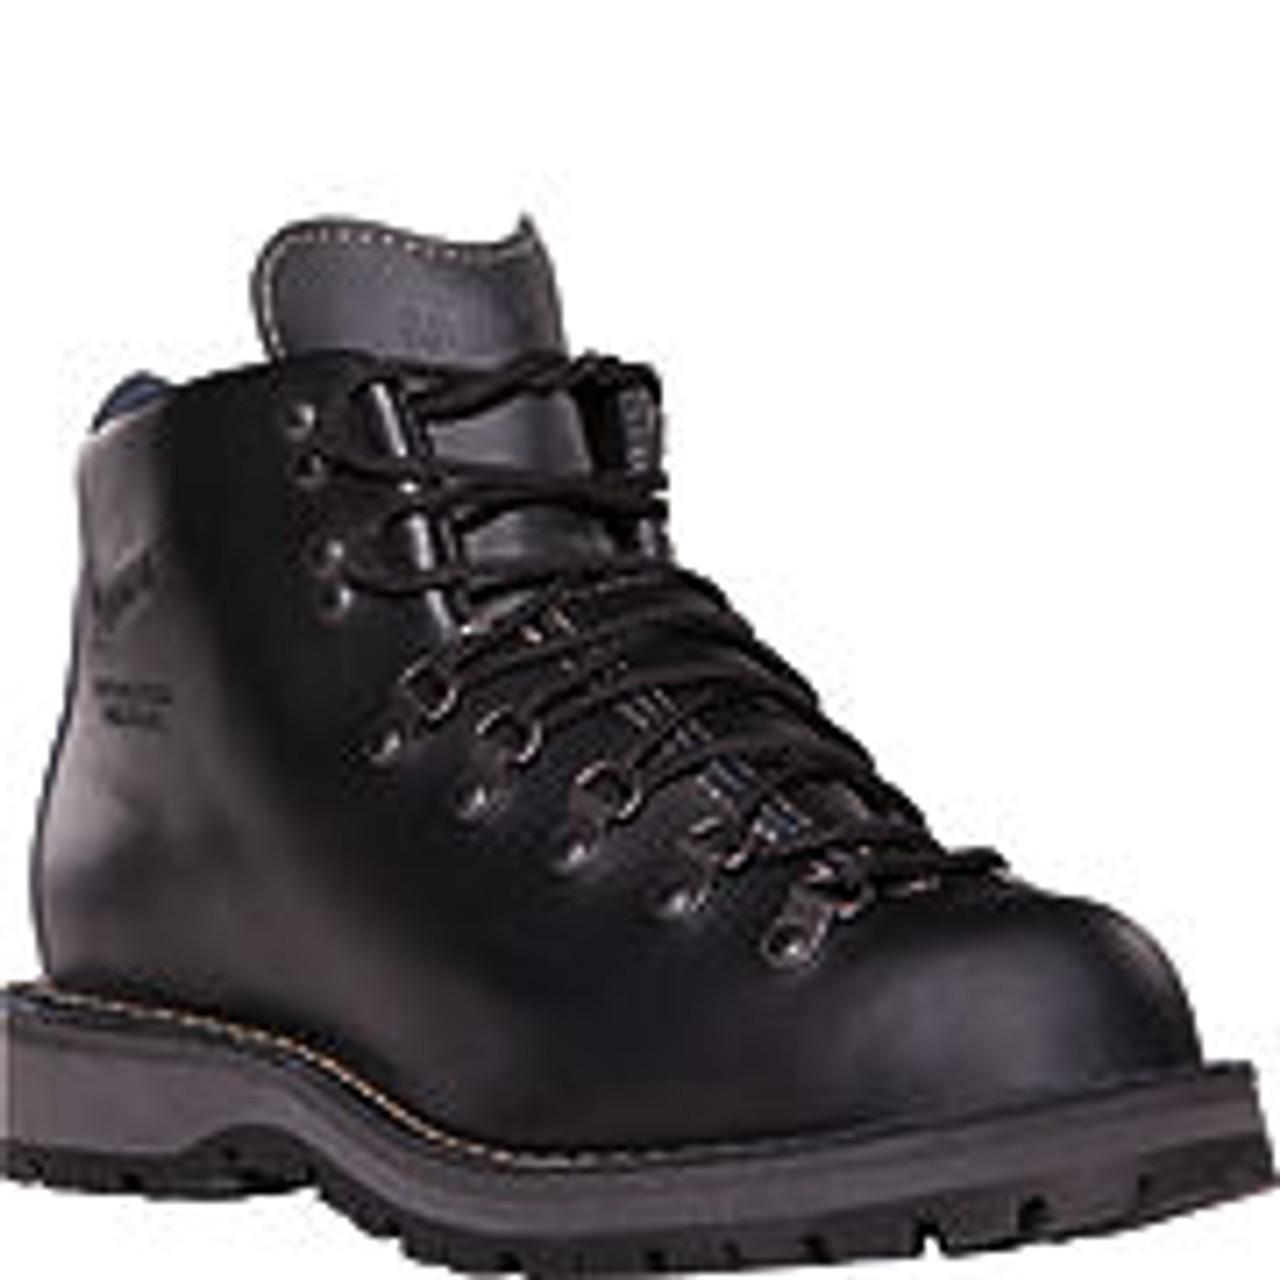 1ffba071e6b Danner Mountain Light II Black Mens Hiking Boots 30860